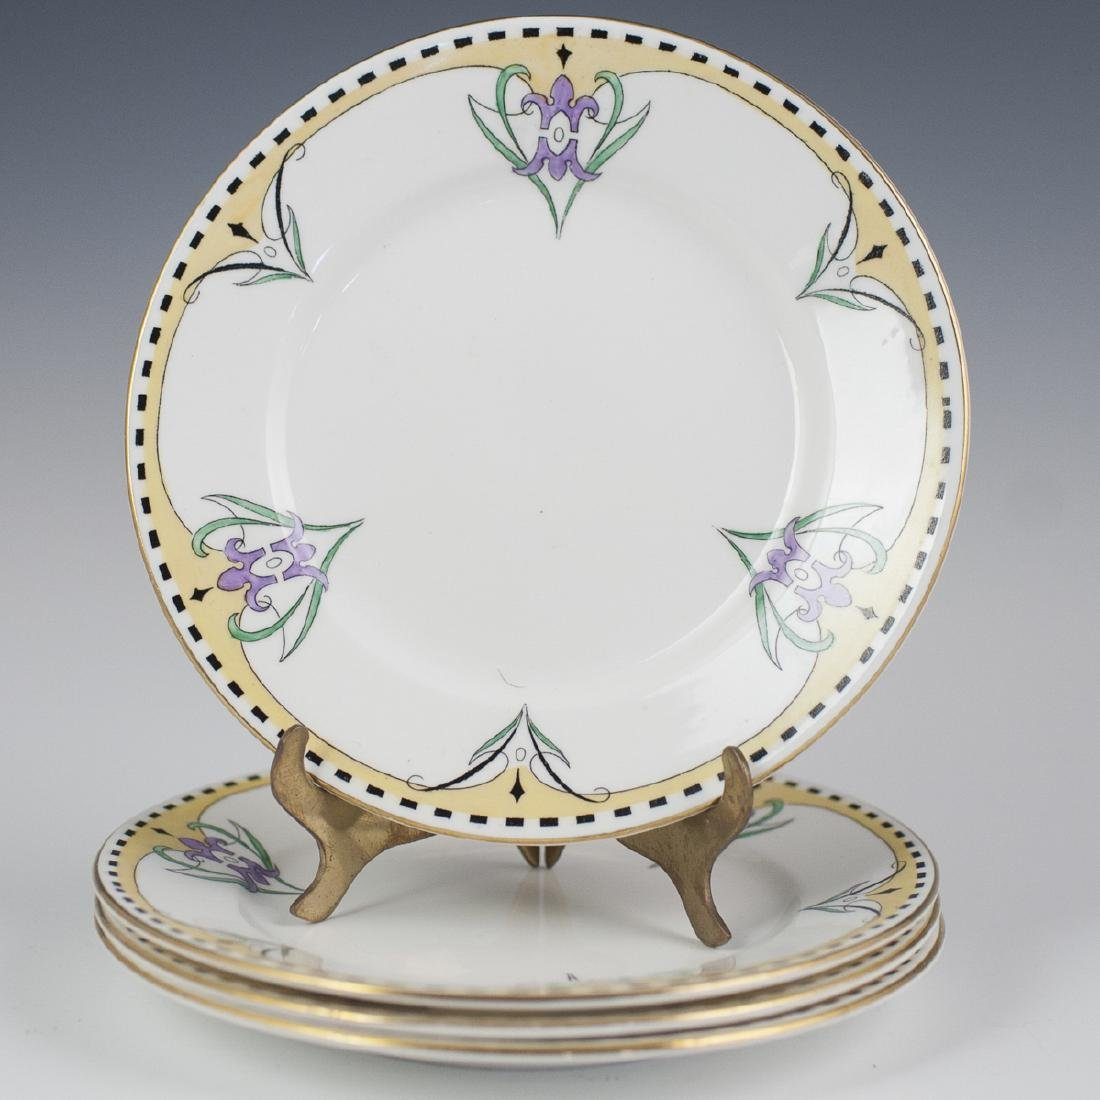 Shelley Art Deco Bone China Cocktail Plates